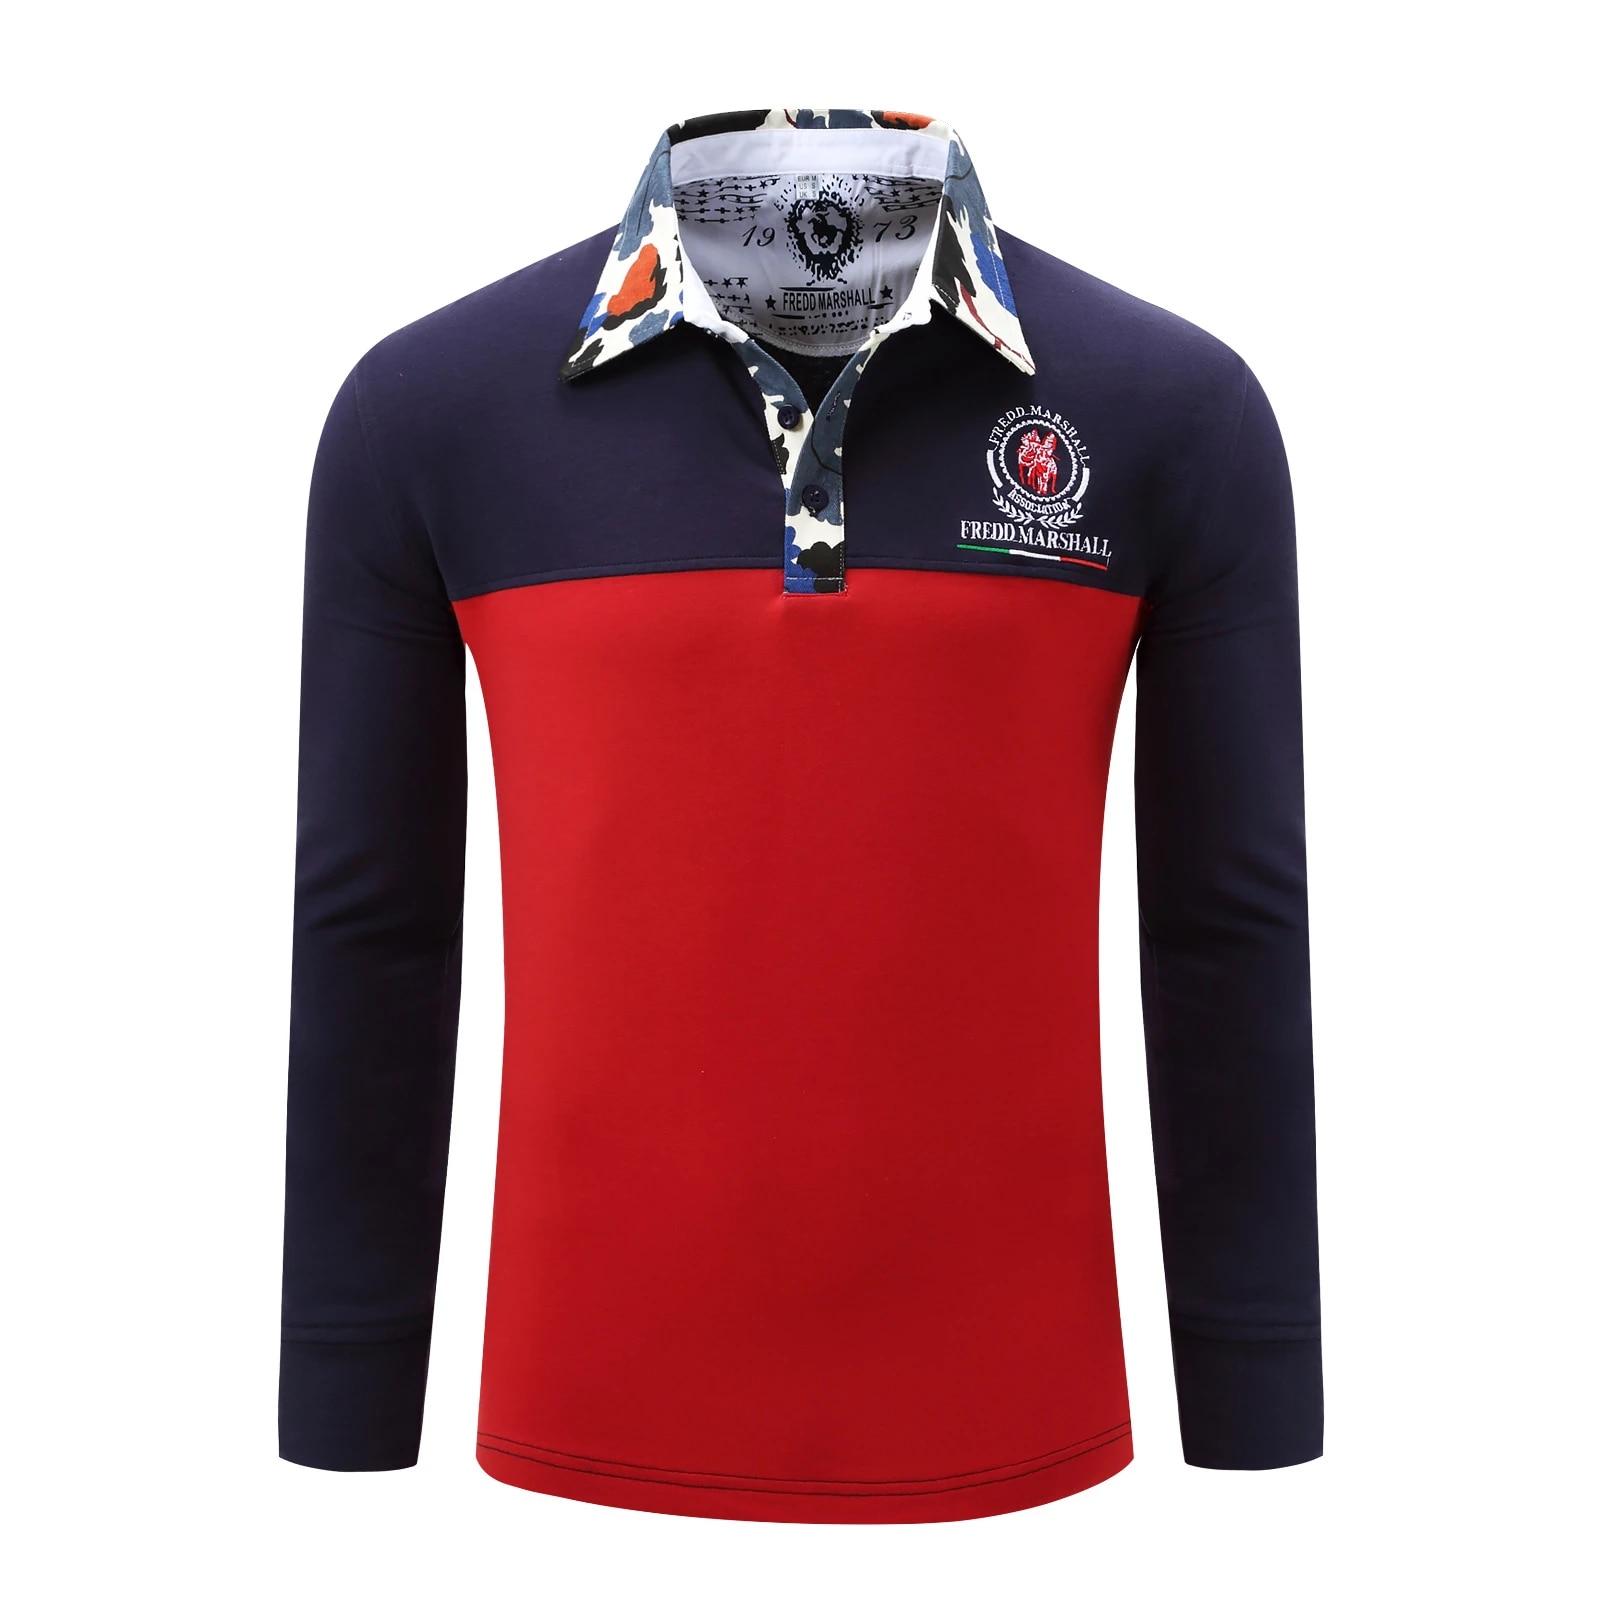 Fredd Marshall Mens Polo Shirt Designer Brands 2017 Man Long Sleeve Fashion Casual Polo Shirts Slim Fit Button Polos Men 059